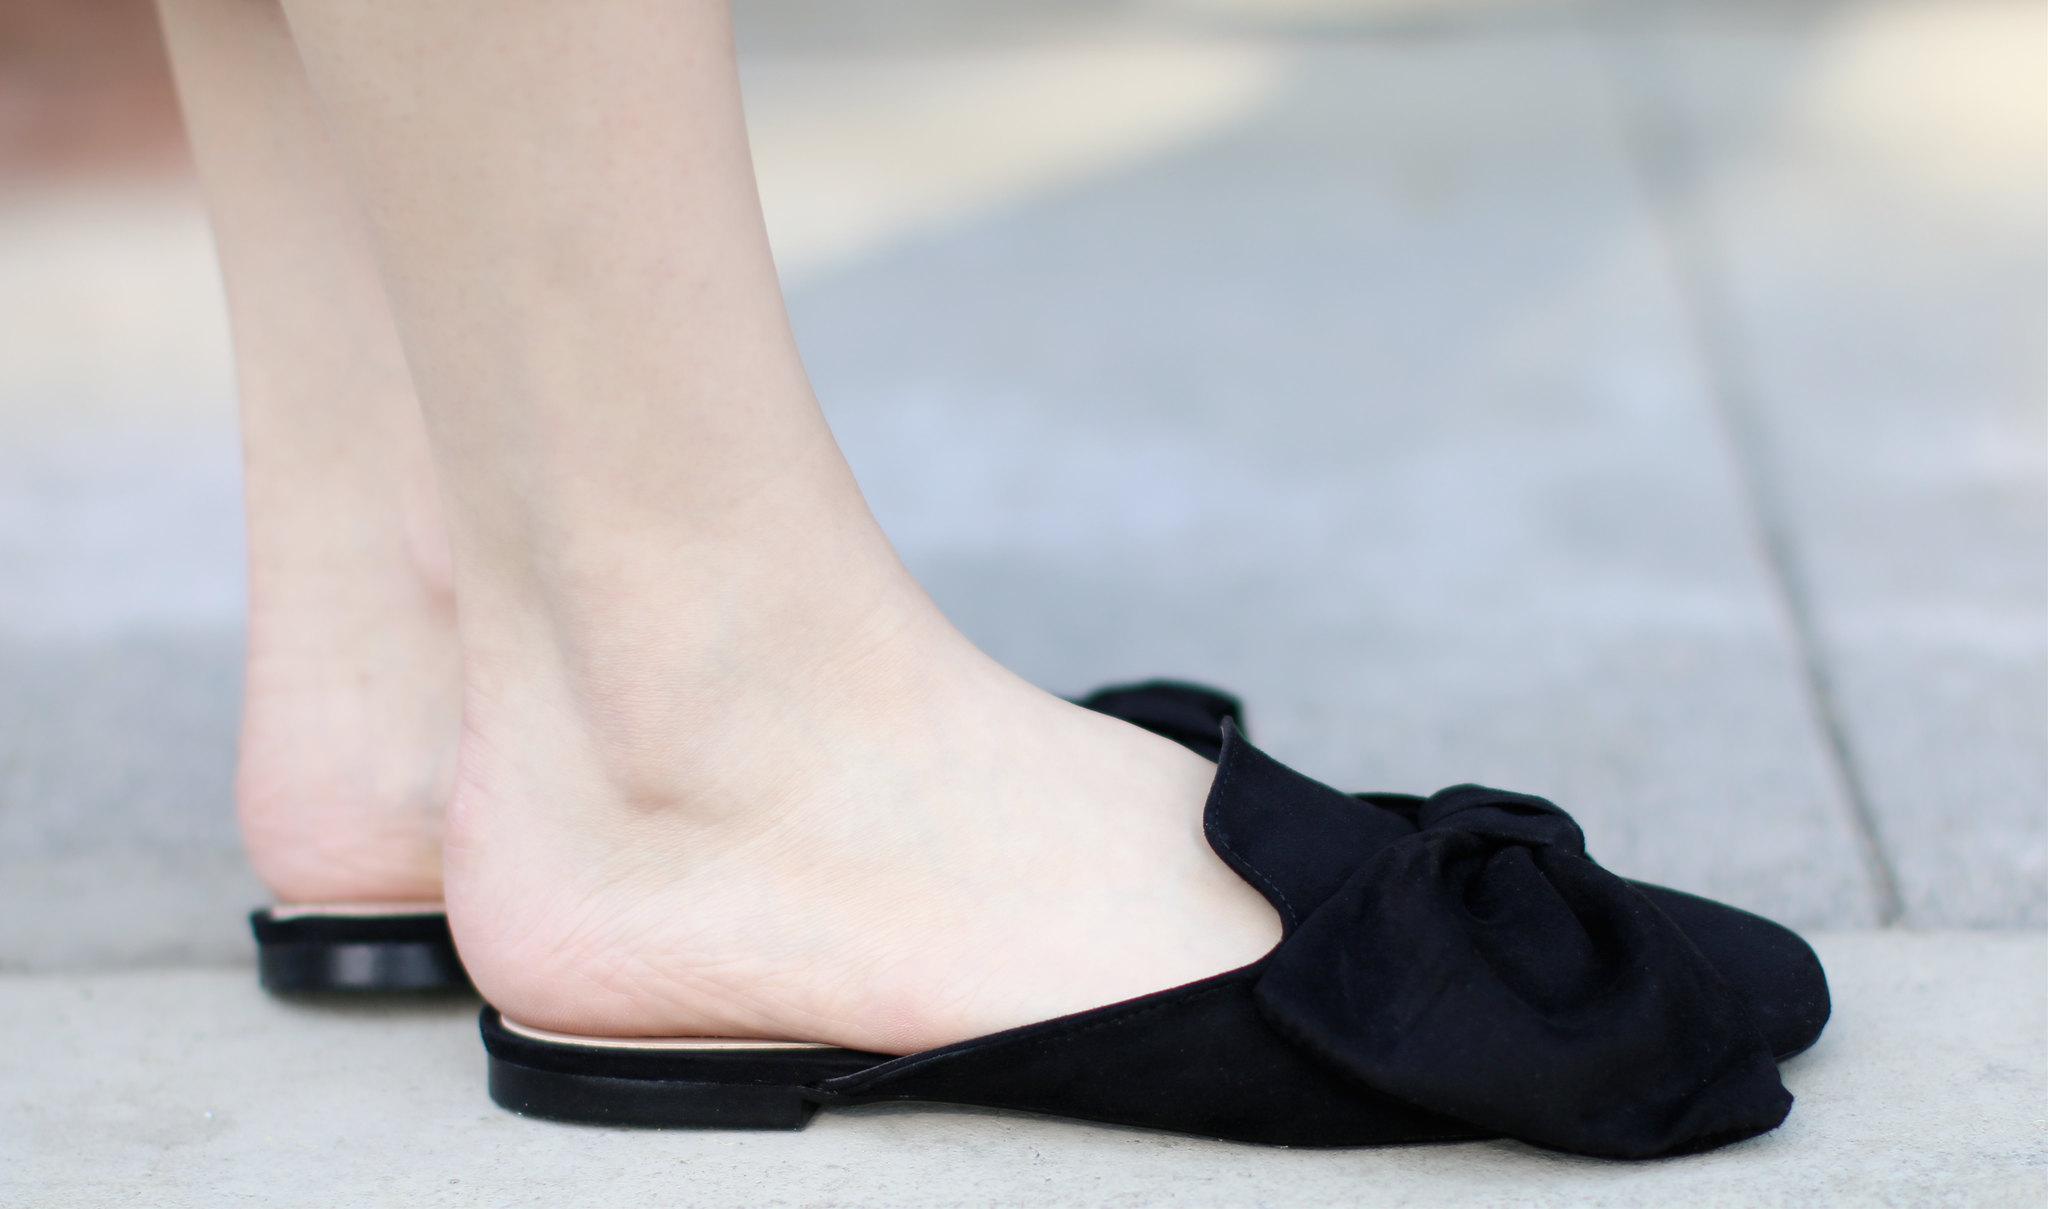 5273-ootd-fashion-style-outfitoftheday-wiwt-streetstyle-owlxfish-f21xme-romper-jumpsuit-bohochic-bershka-zara-summer-elizabeeetht-clothestoyouuu